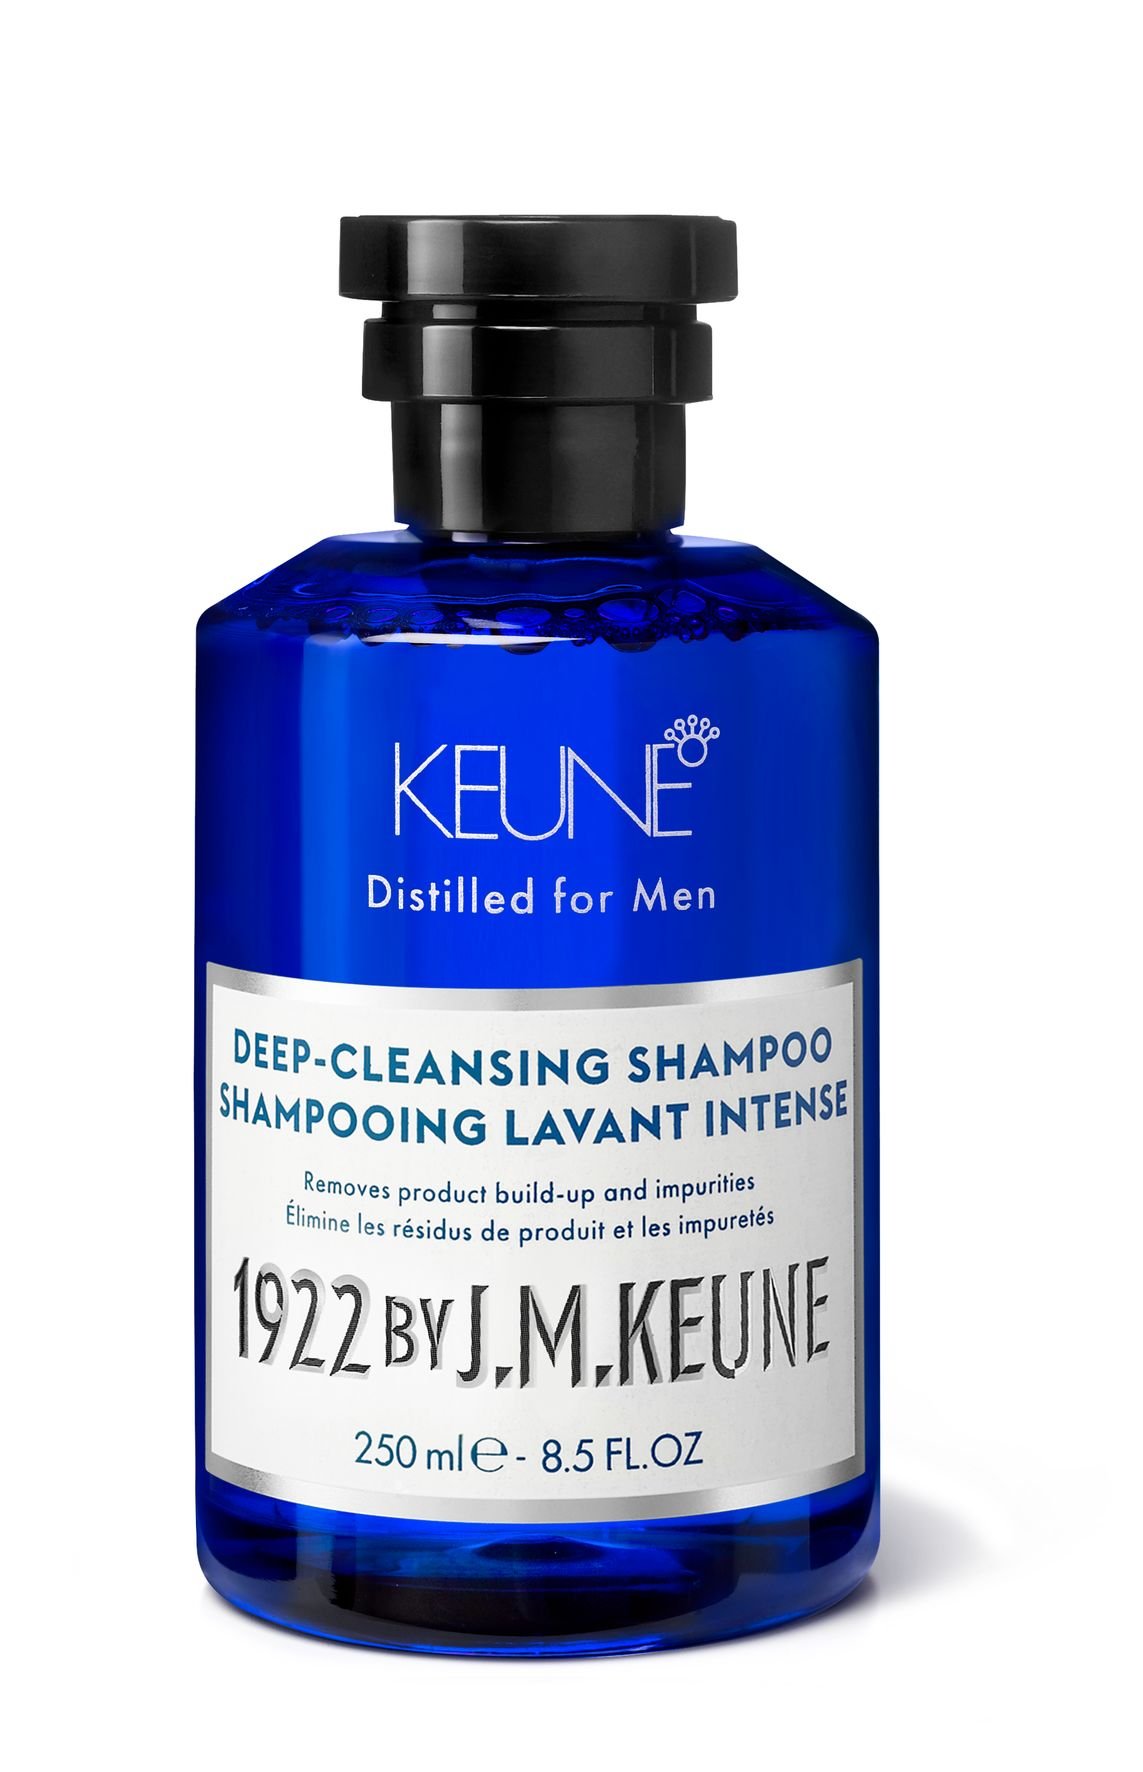 1922 BY J.M. KEUNE DEEP-CLEANSING SHAMPOO